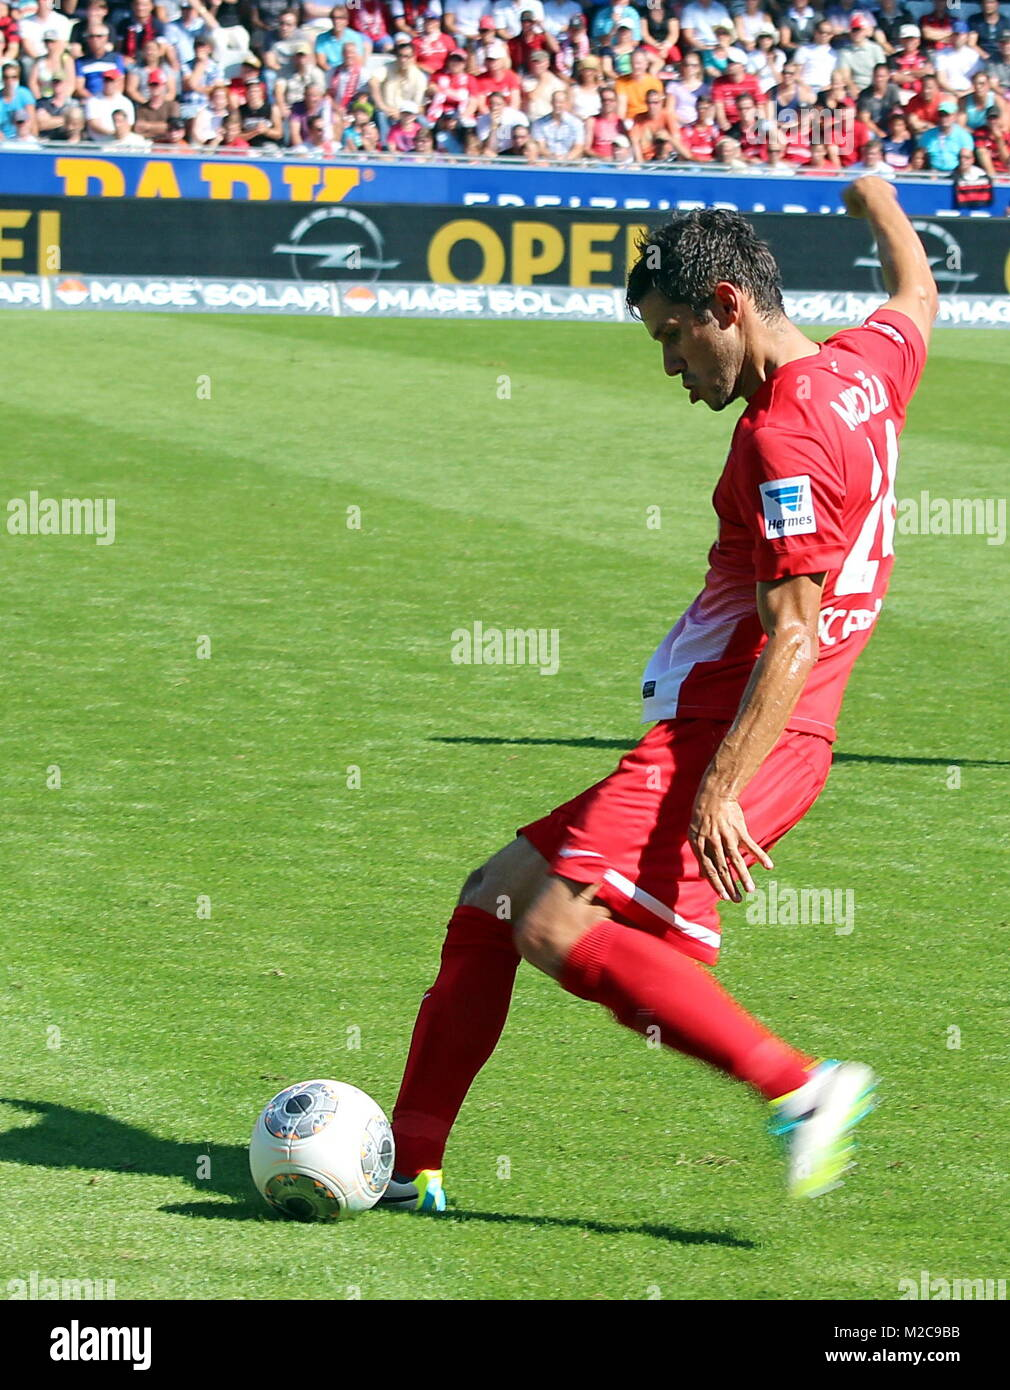 Mensur Mujdzza, SC Freiburg am Ball - Fußball-Bundesliga: 2. Spieltag, SC Freiburg vs FSV Mainz 05 Stock Photo